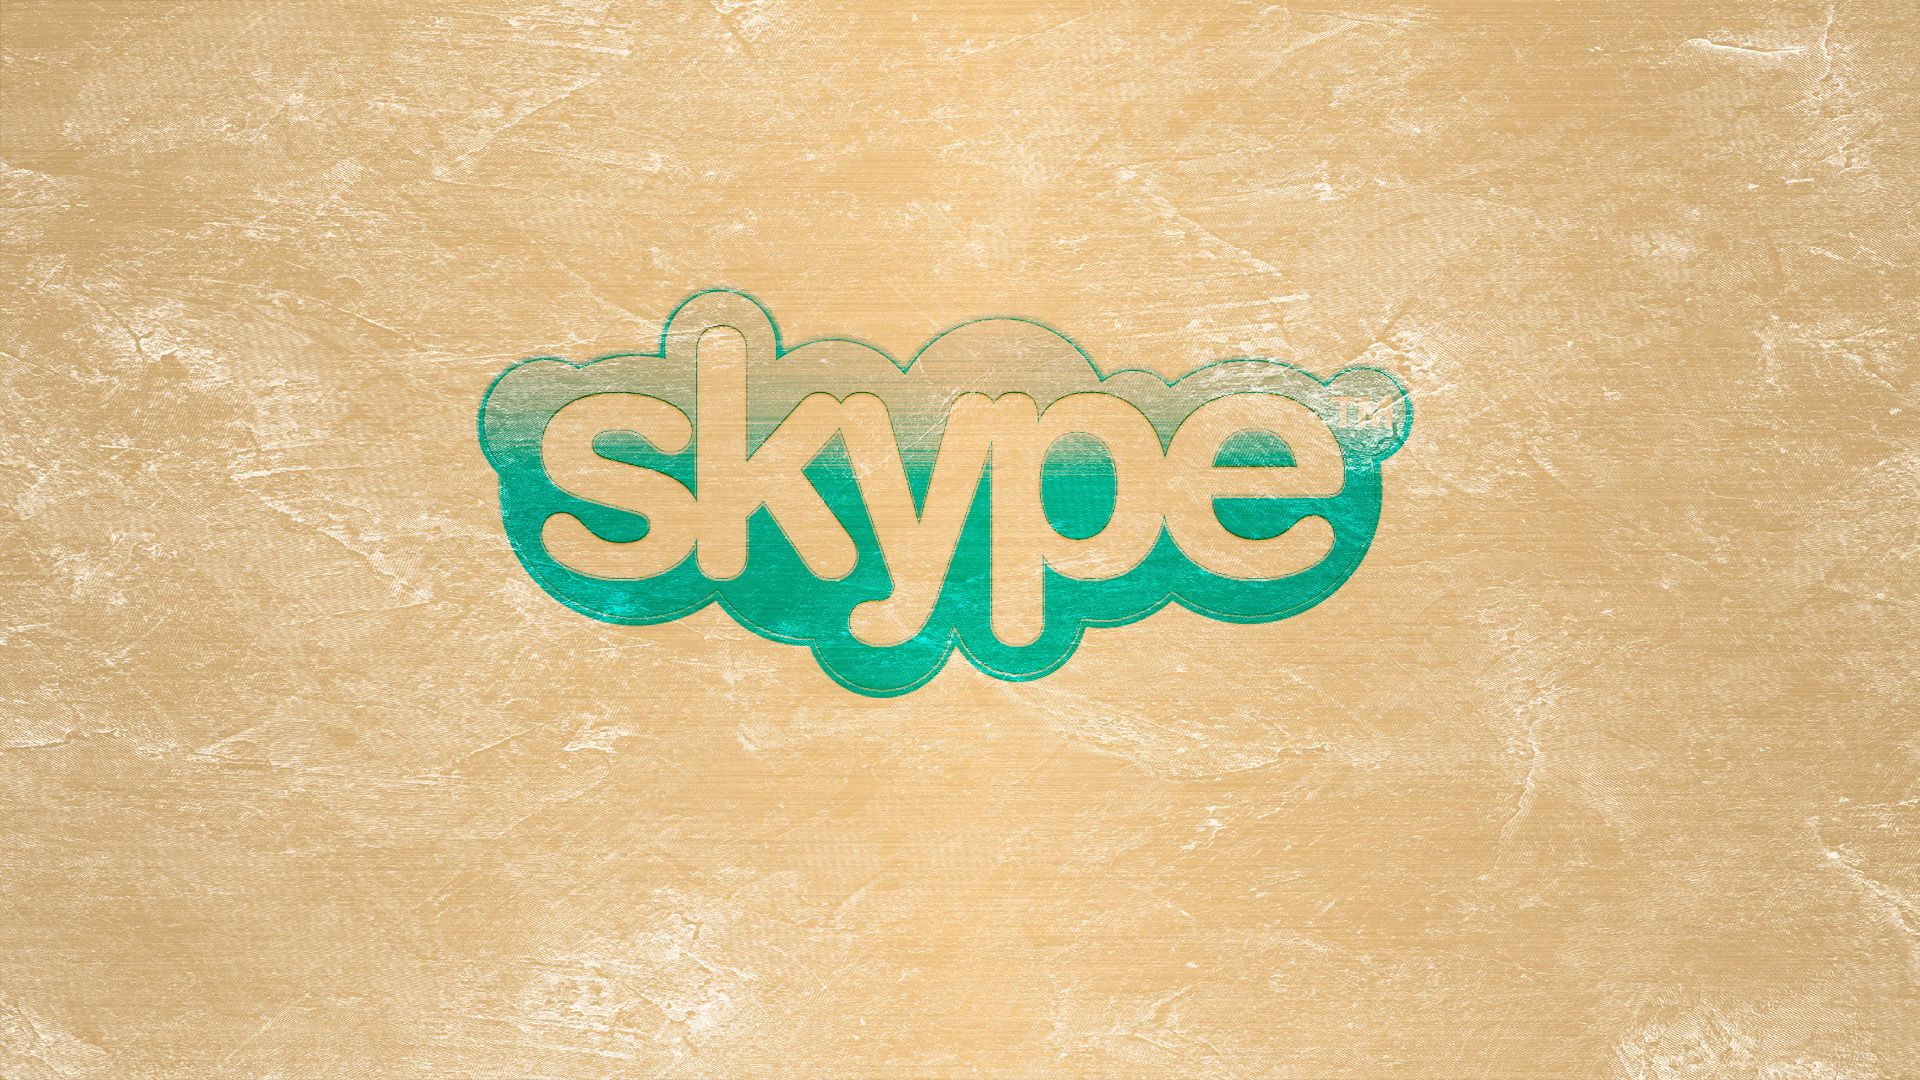 Microsoft's Skype draws inspiration from Snapchat in big